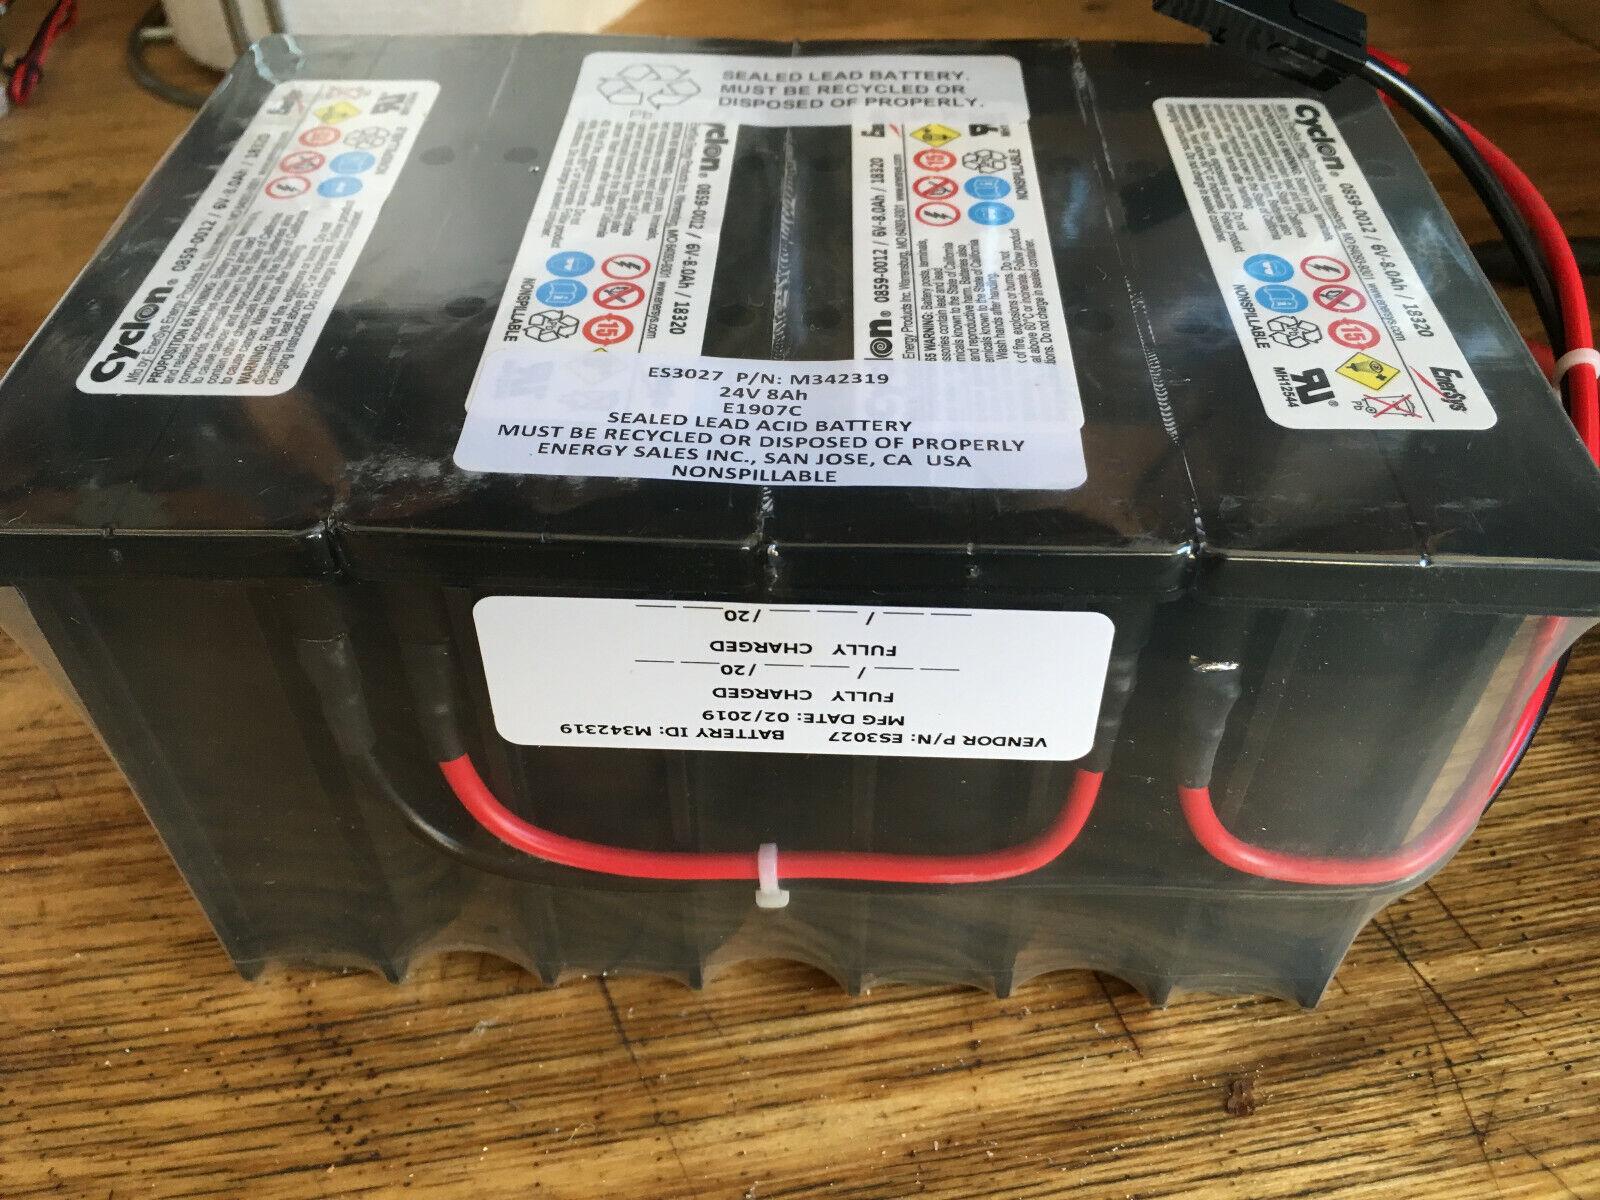 Enersys Cyclon 6V-8.0AH AGM Battery, configured as 24V. 8AH